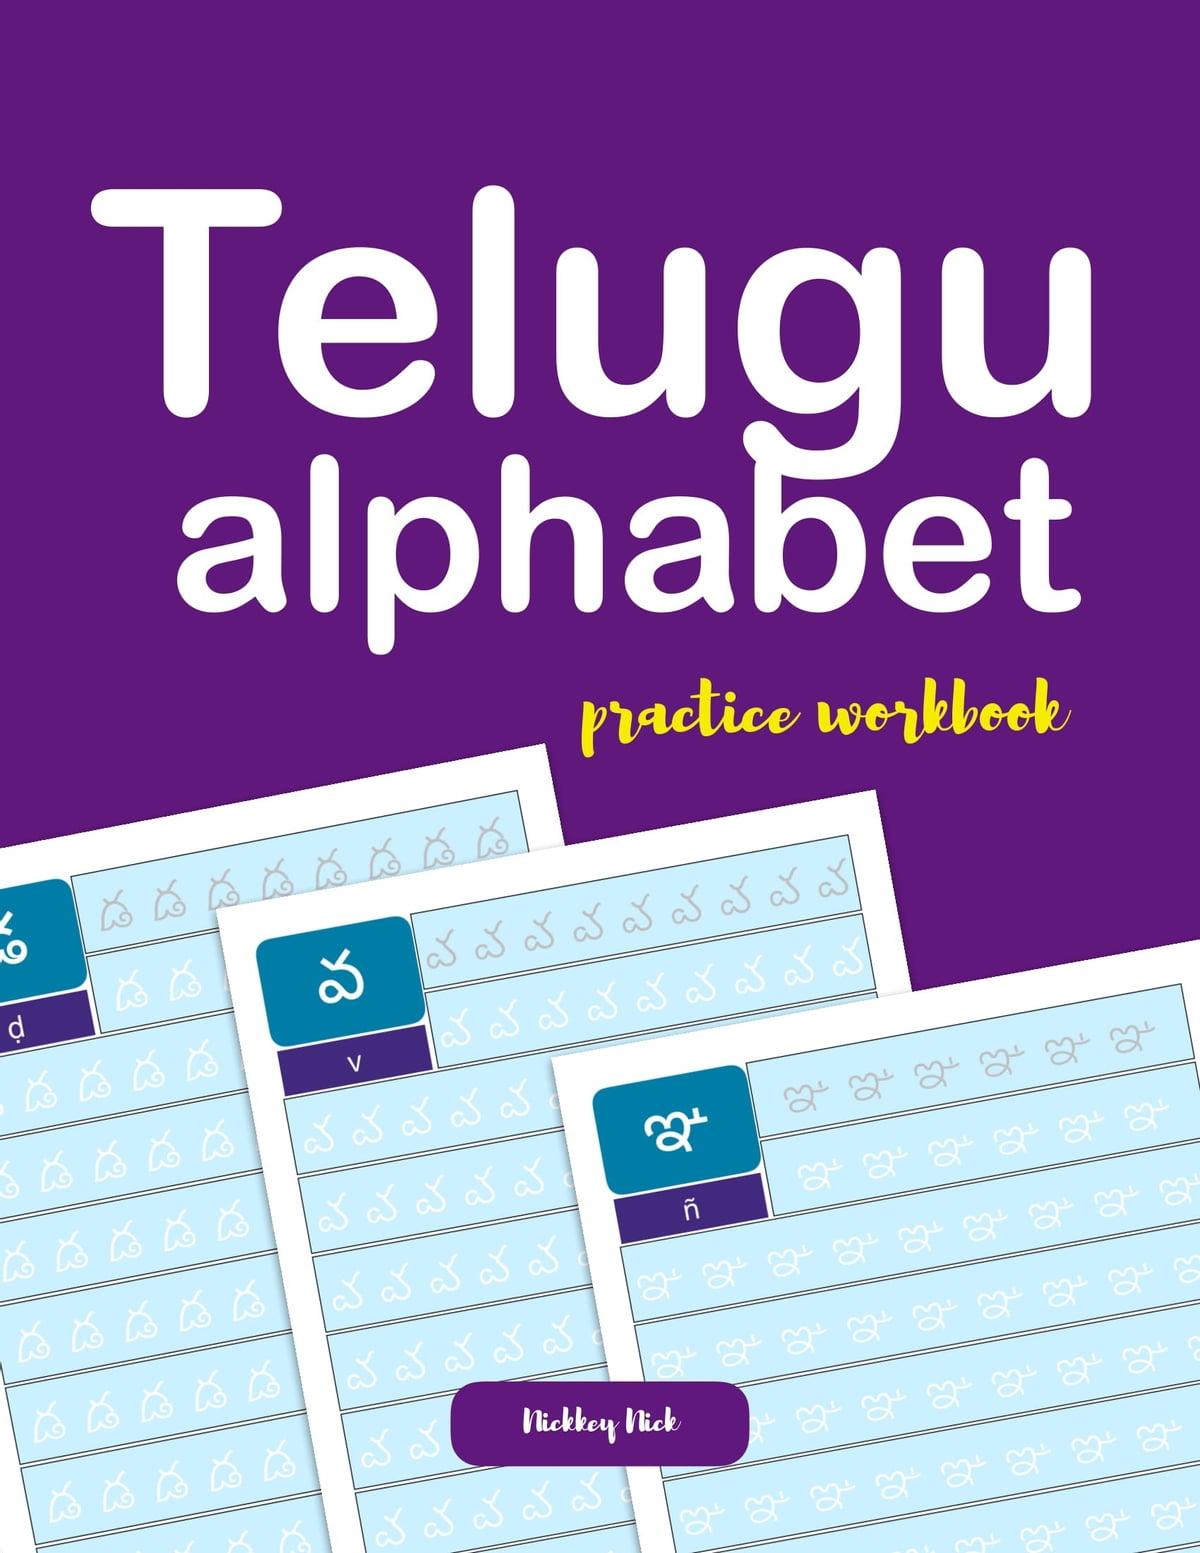 Telugu Alphabet Handwriting Ebook By Nickkey Nick